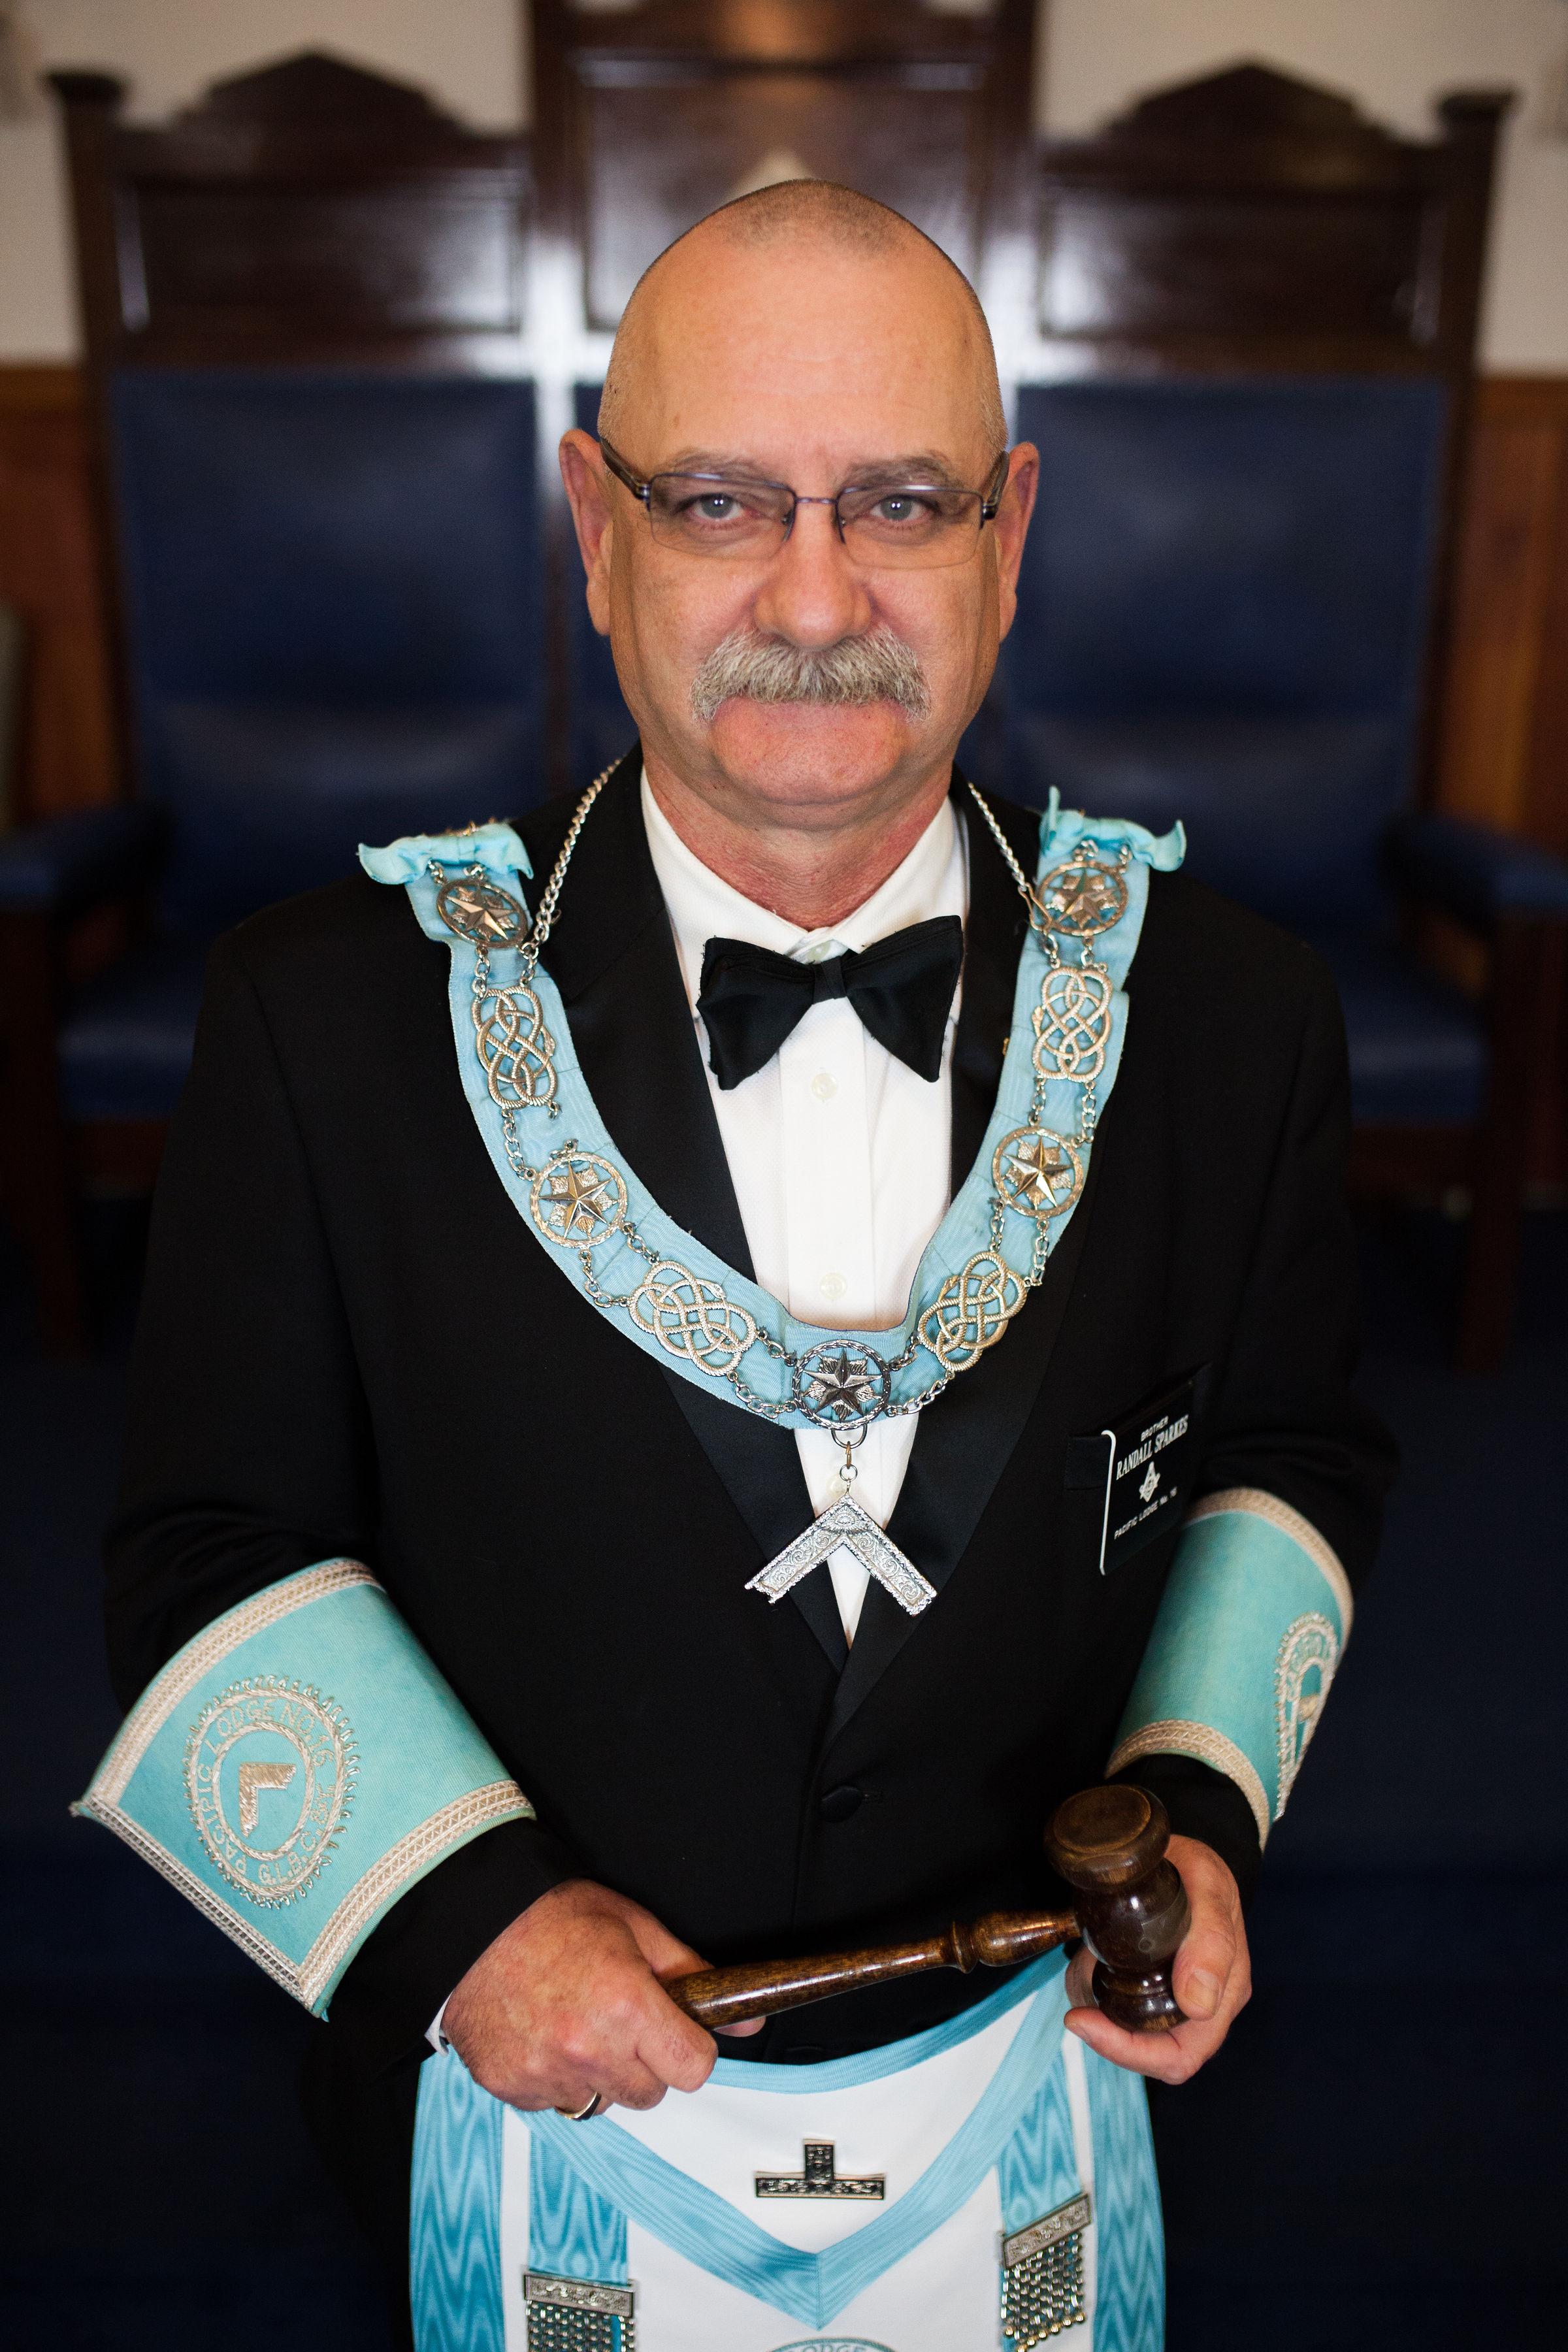 Worshipful Master - W. Bro. Randall Sparkes